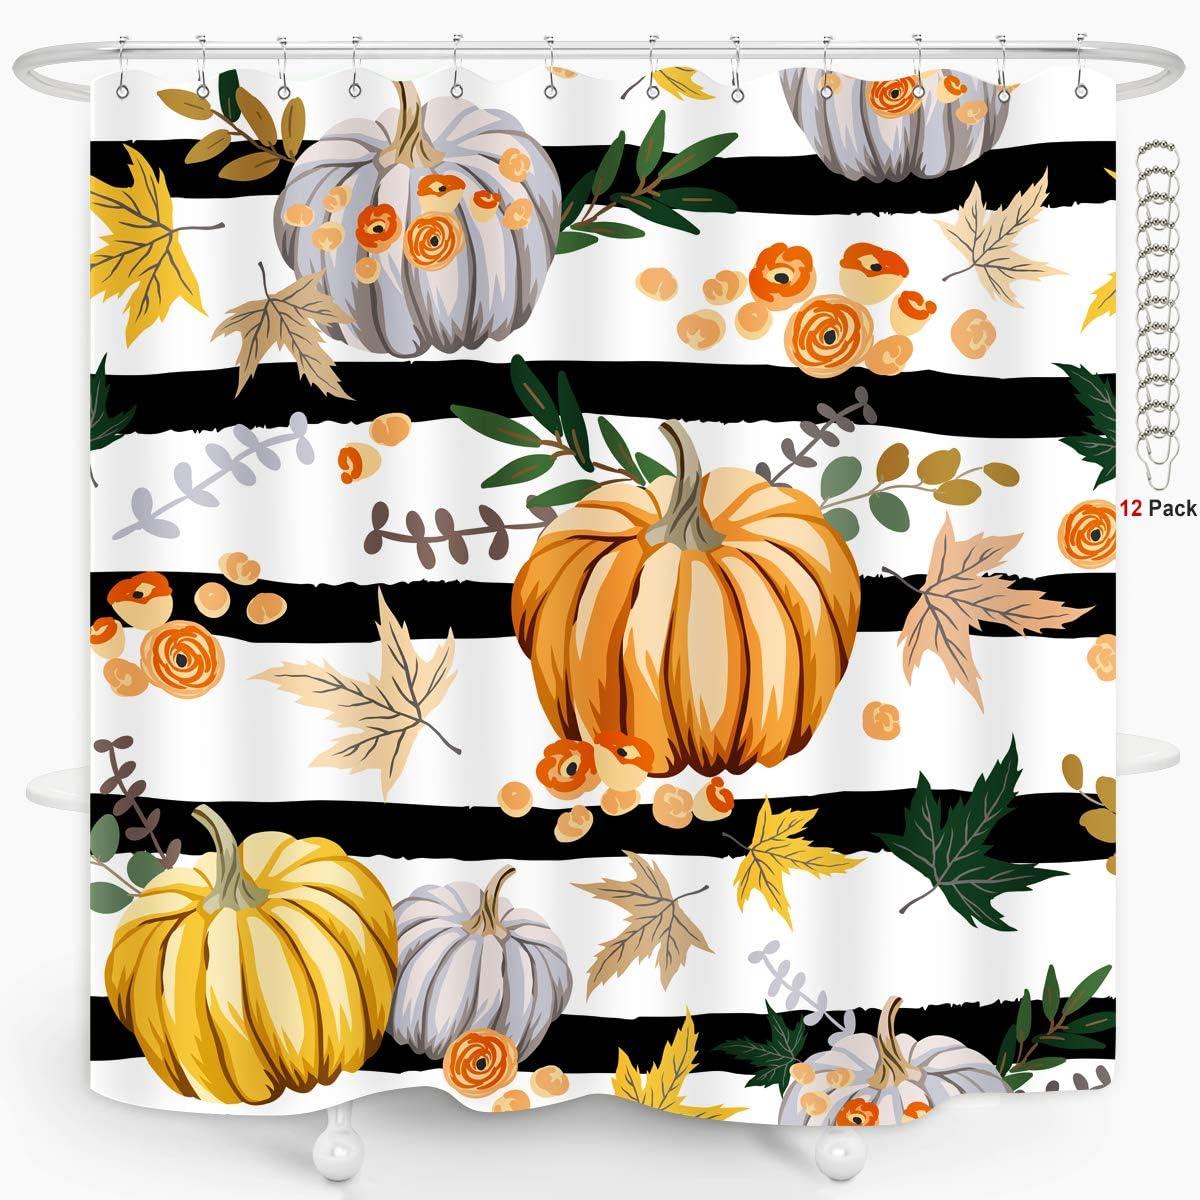 ZXMBF Fall Pumpkin Shower Curtain Metal Hooks 12PCS Autumn Harvesting Farmhouse Stripe Thanksgiving Home Bathroom Décor Waterproof Fabric 72x72 Inch